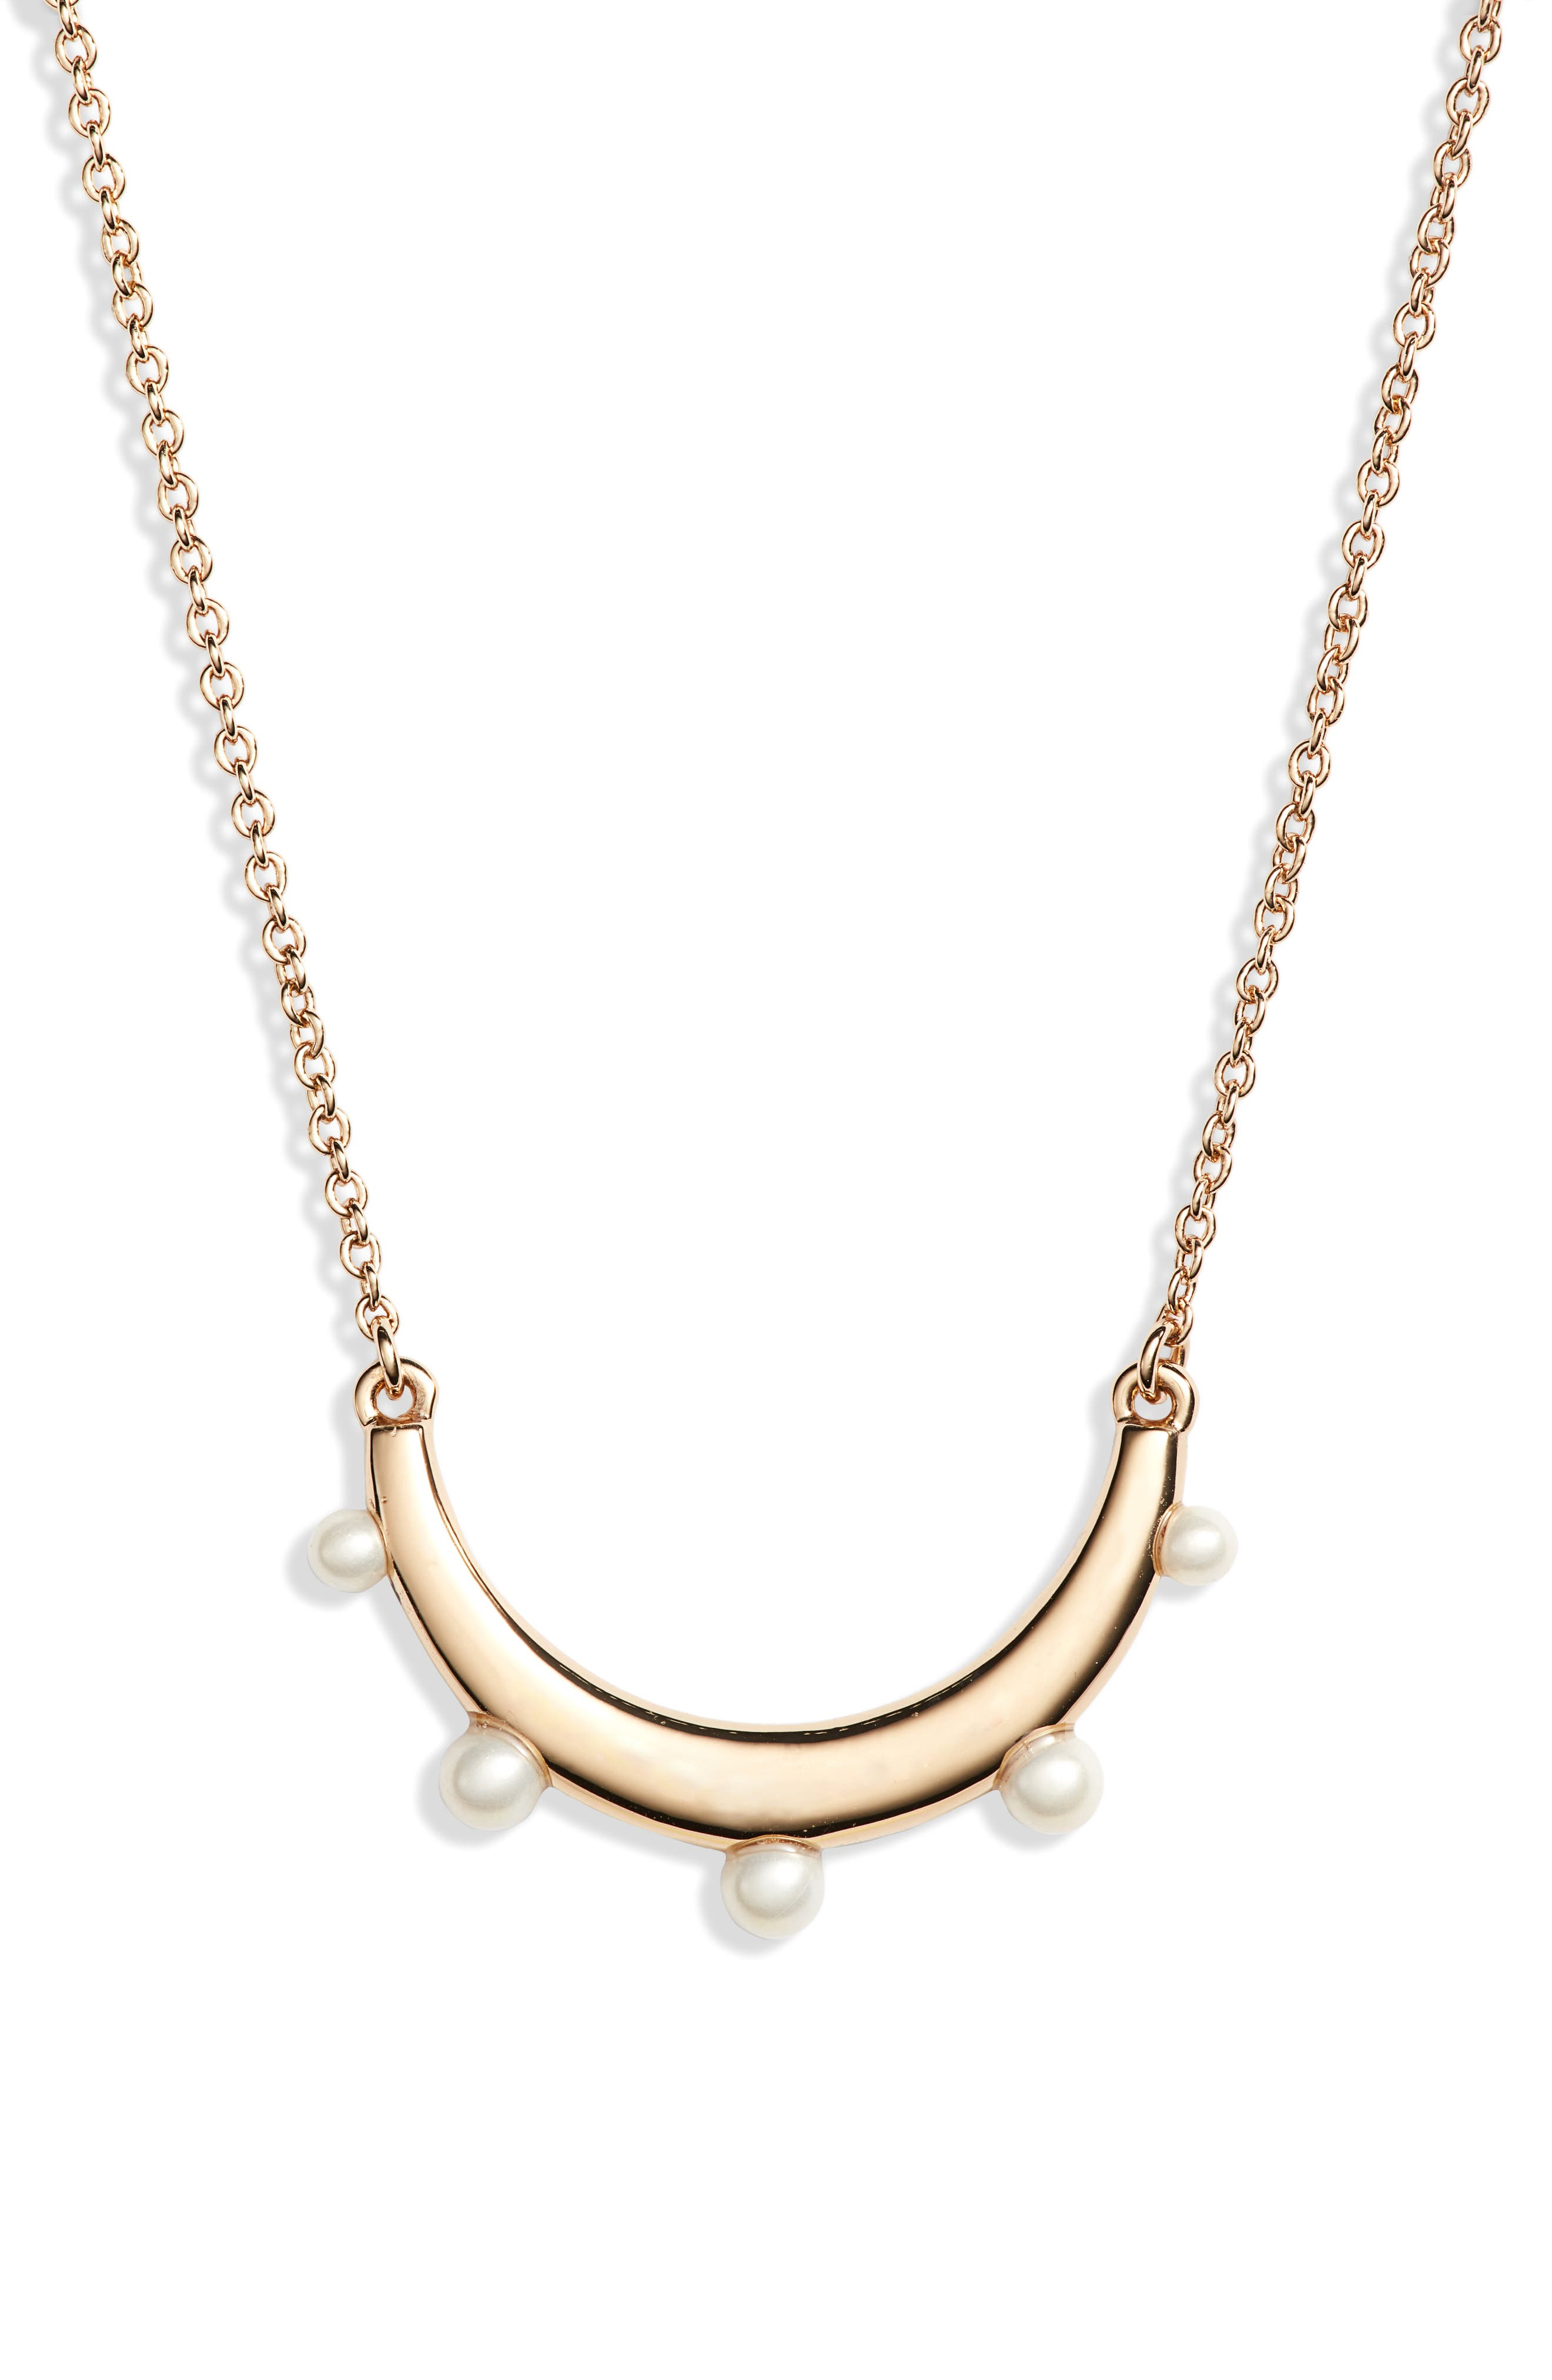 Imitation Pearl Pendant Necklace,                             Main thumbnail 1, color,                             GOLD/ PEARL